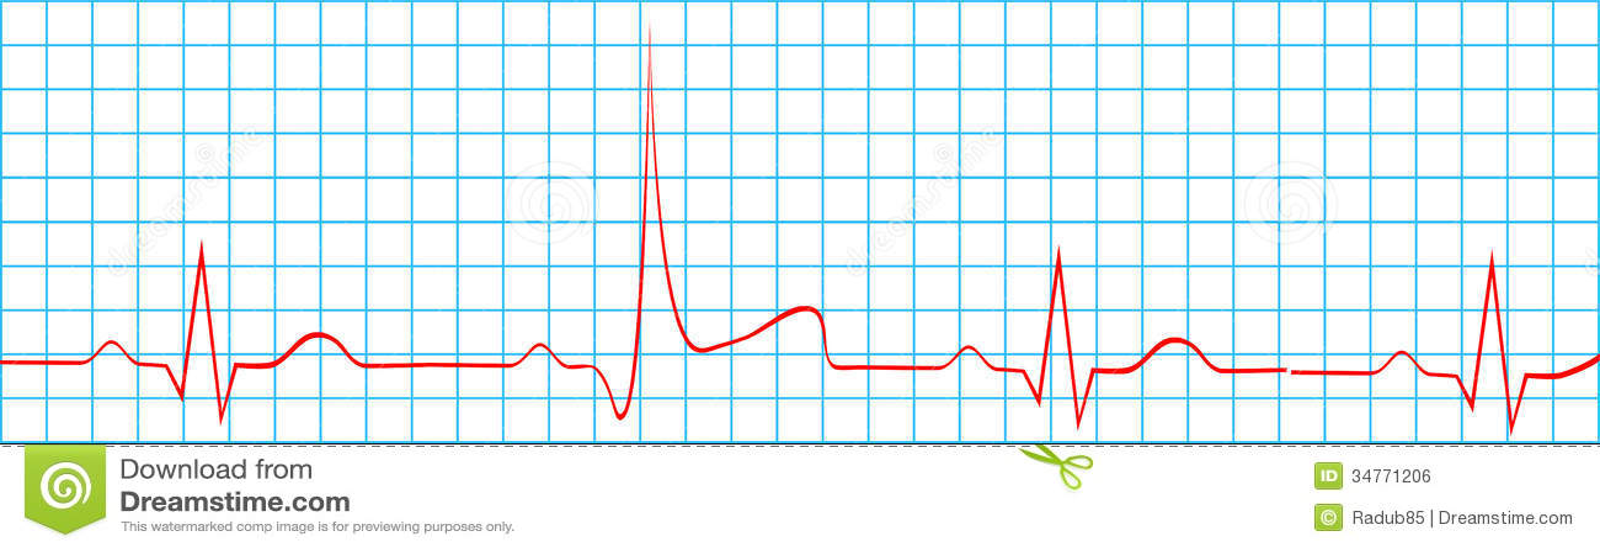 Heart Attack Stroke Electrocardiogram Record Vector Illustration Rhythm Illustrations Royalty Free